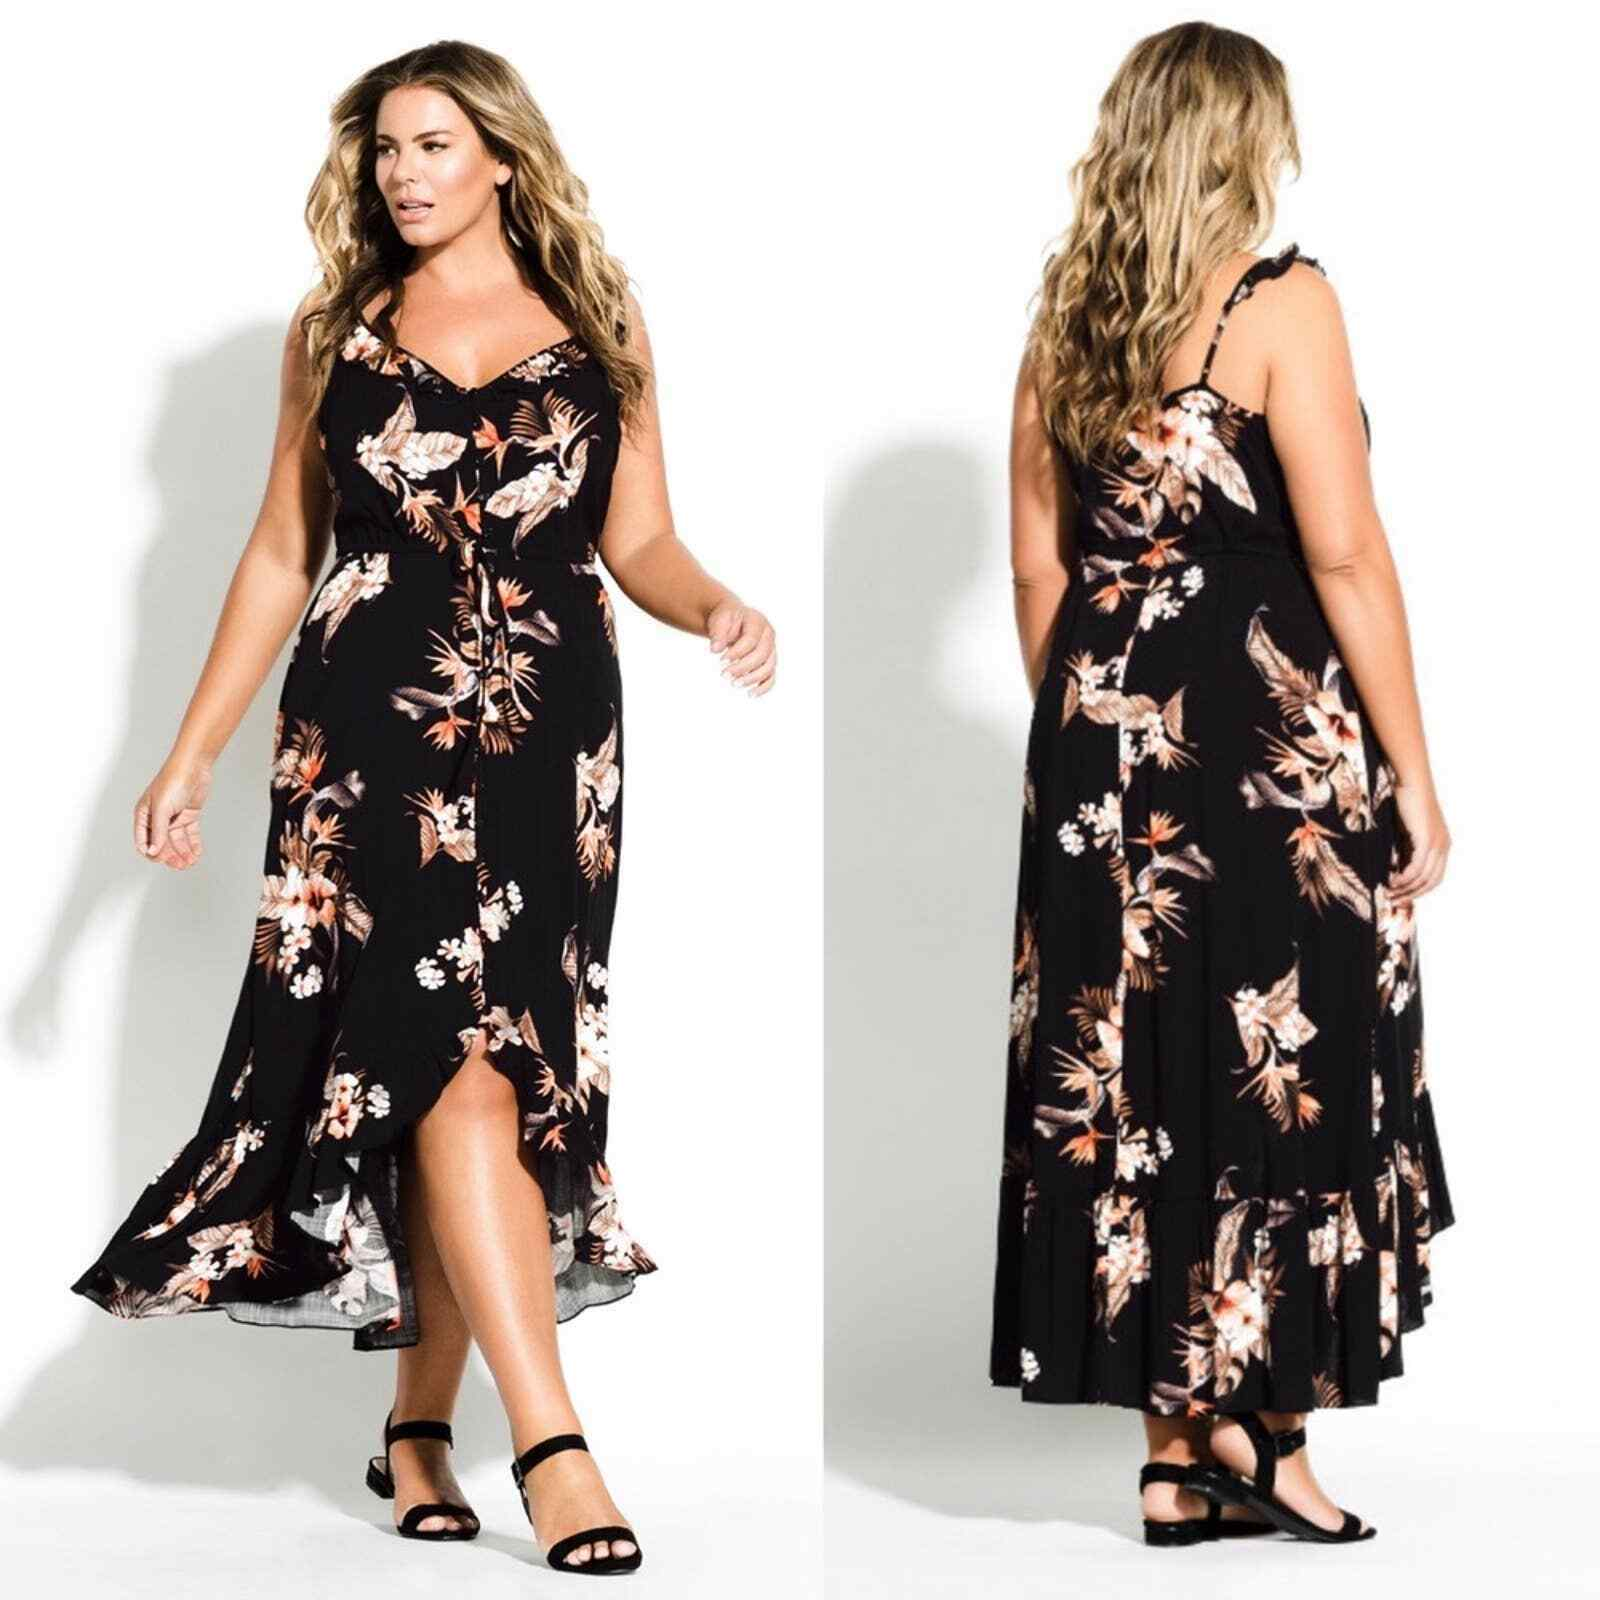 City Chic Seville Black Floral Swing Midi Dress - image 2